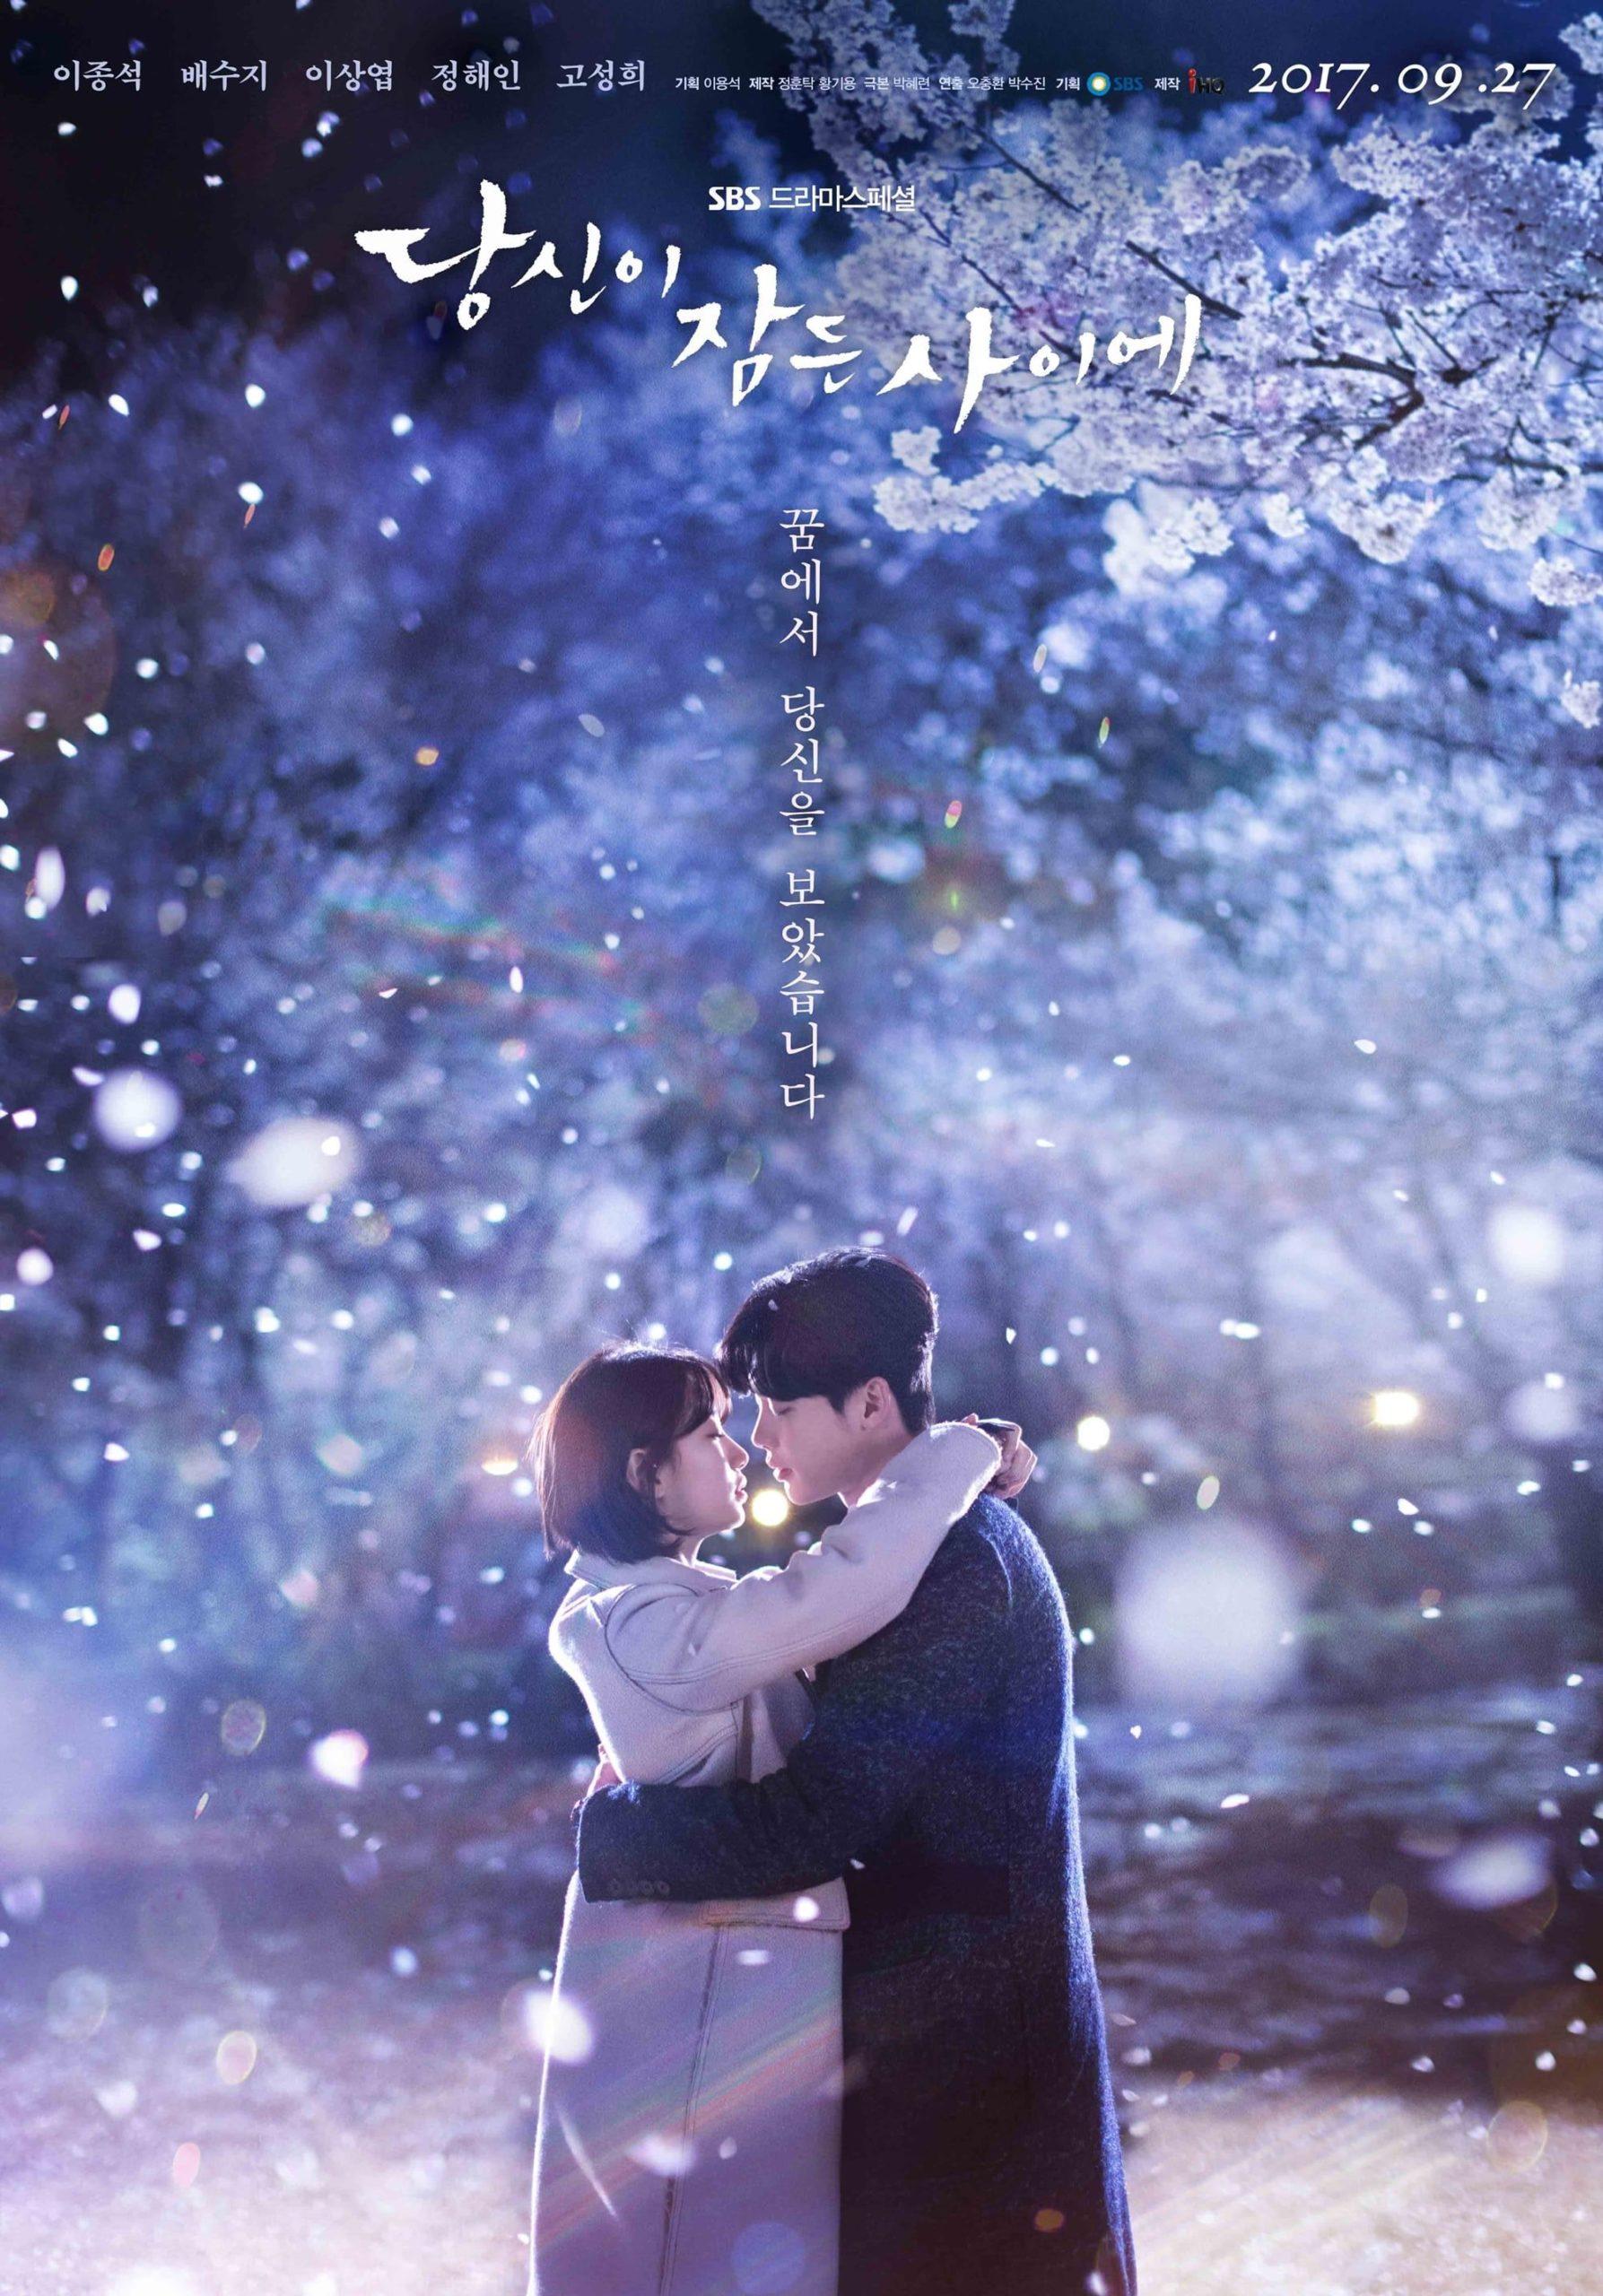 Drama Korea Fantasi : drama, korea, fantasi, Fantasy, Romance, K-Dramas, Watchlist, Kpopmap, Kpop,, Kdrama, Trend, Stories, Coverage